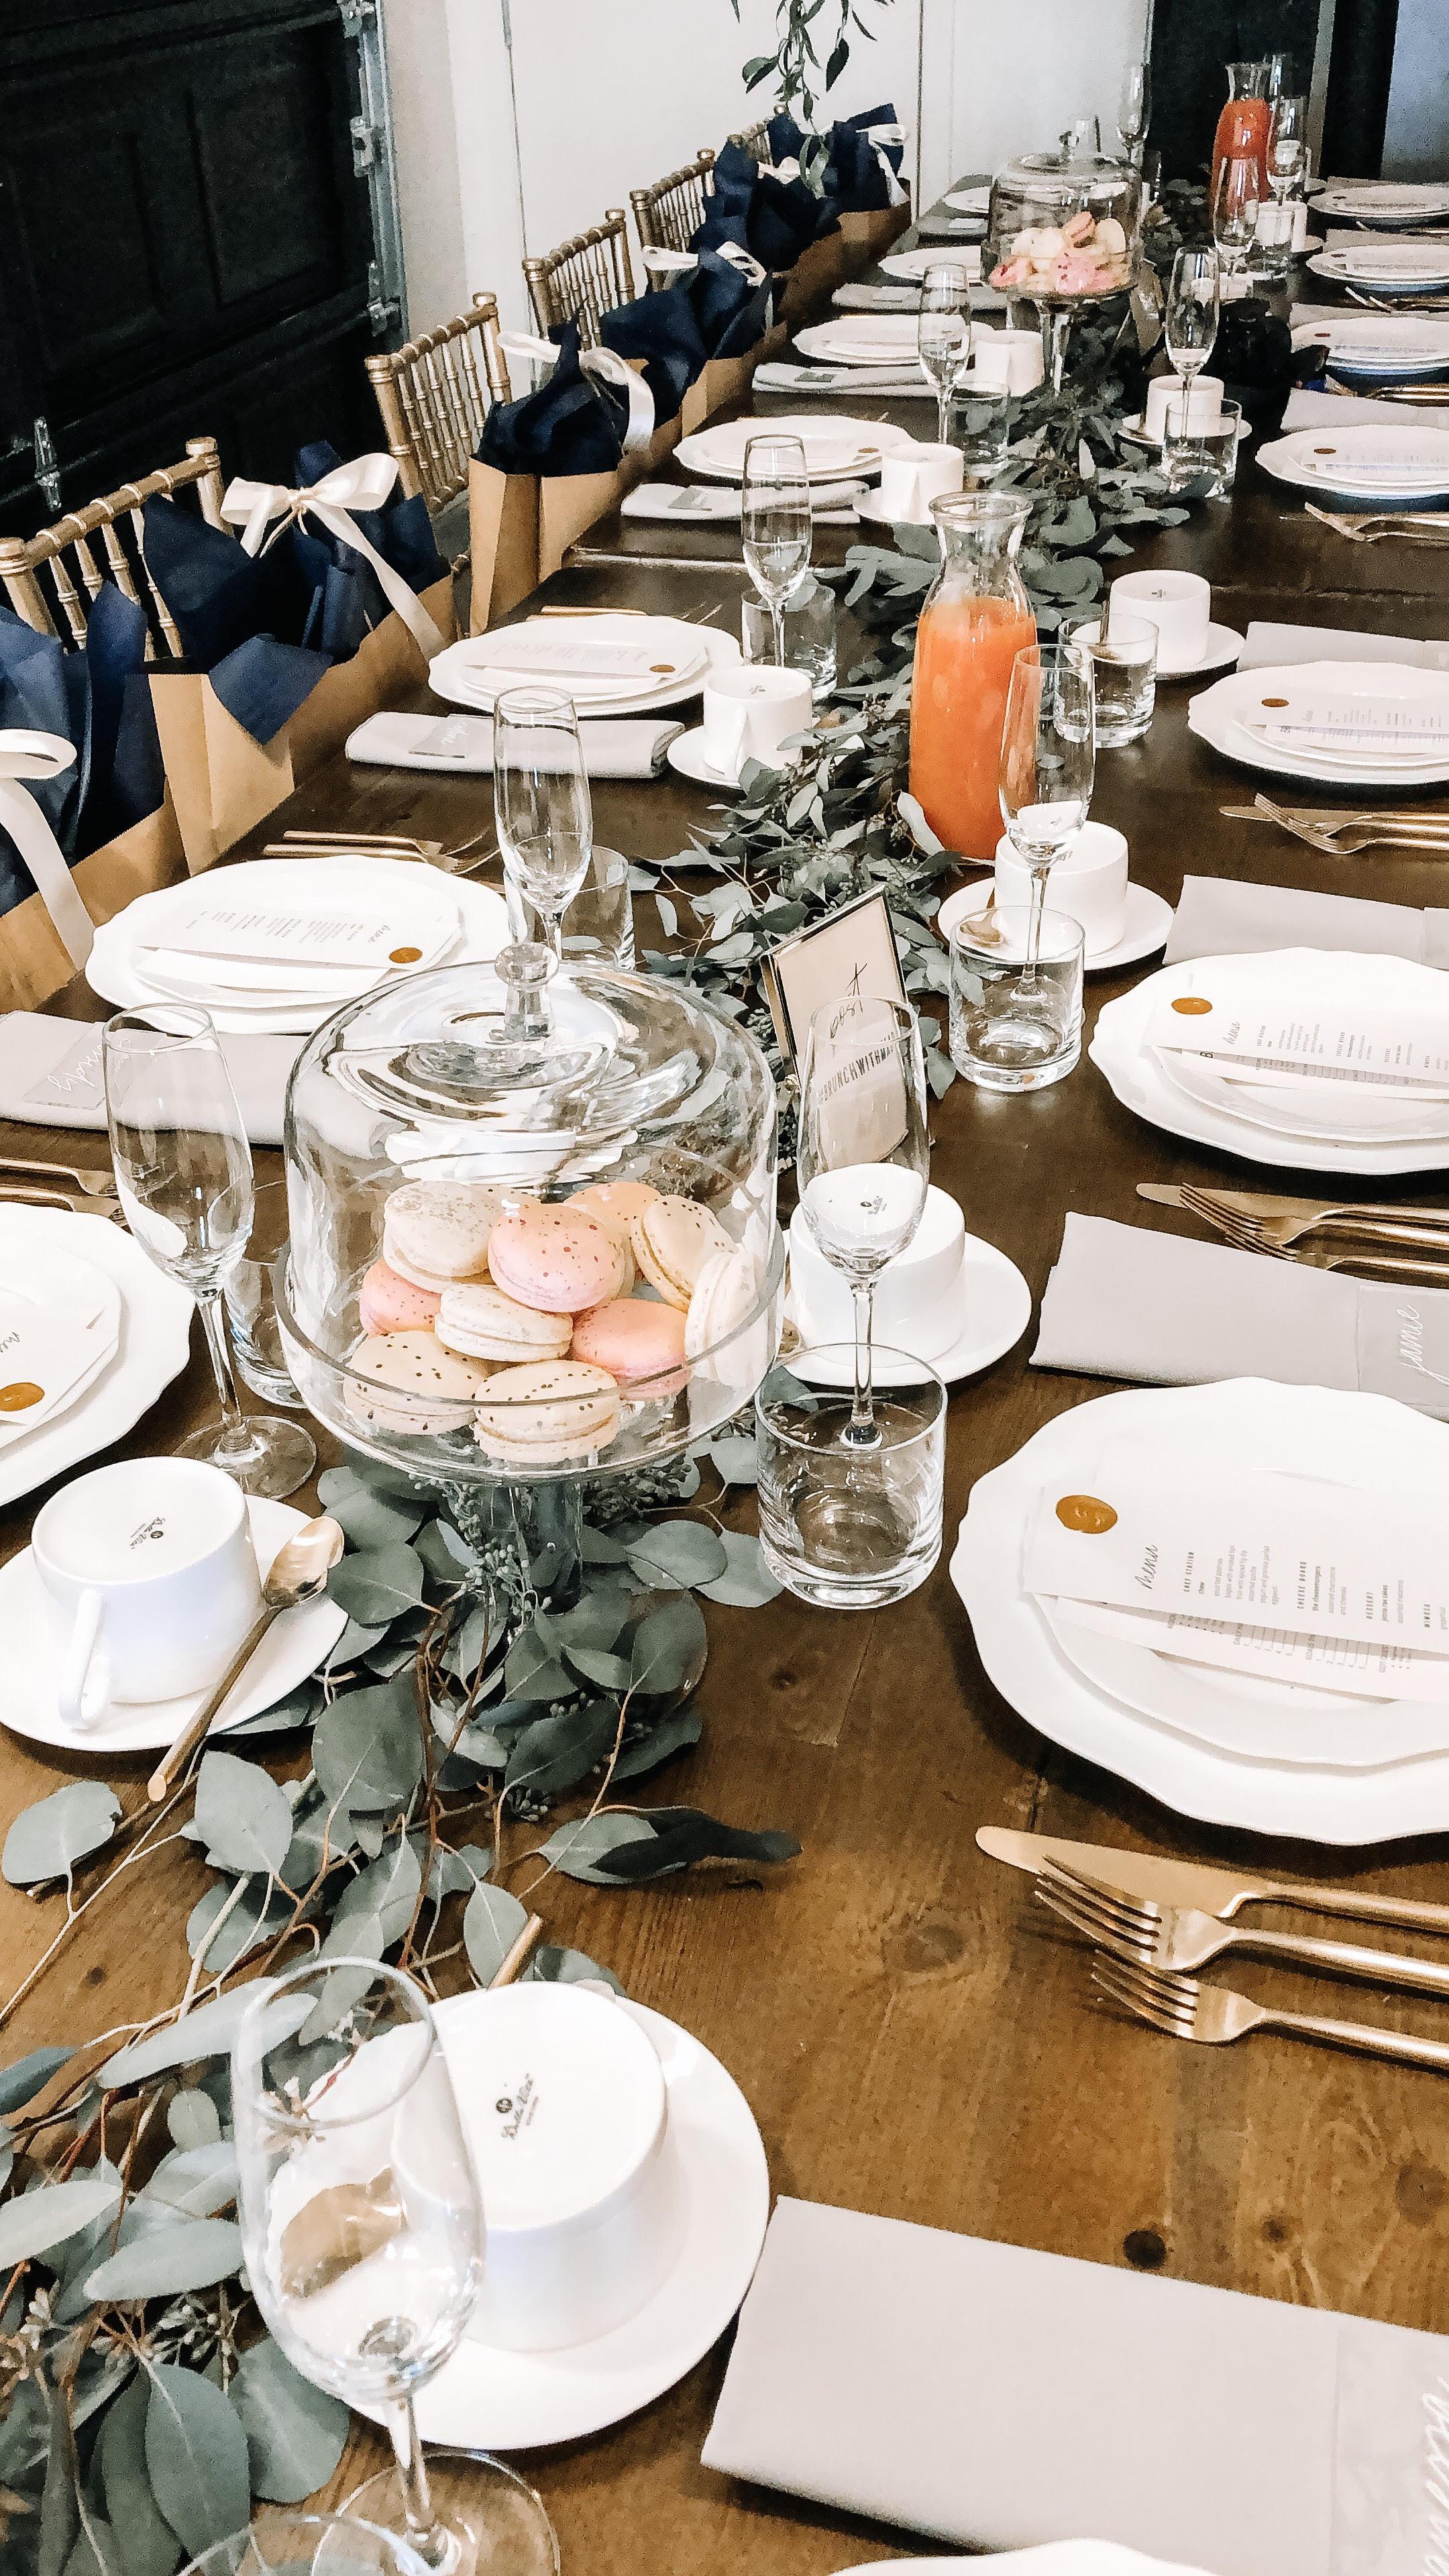 Tables/Chairs/Flatwear - CT Rentals | Macaroons - Jenna Rae Cakes | Menu - Robin Egg Blue Designs